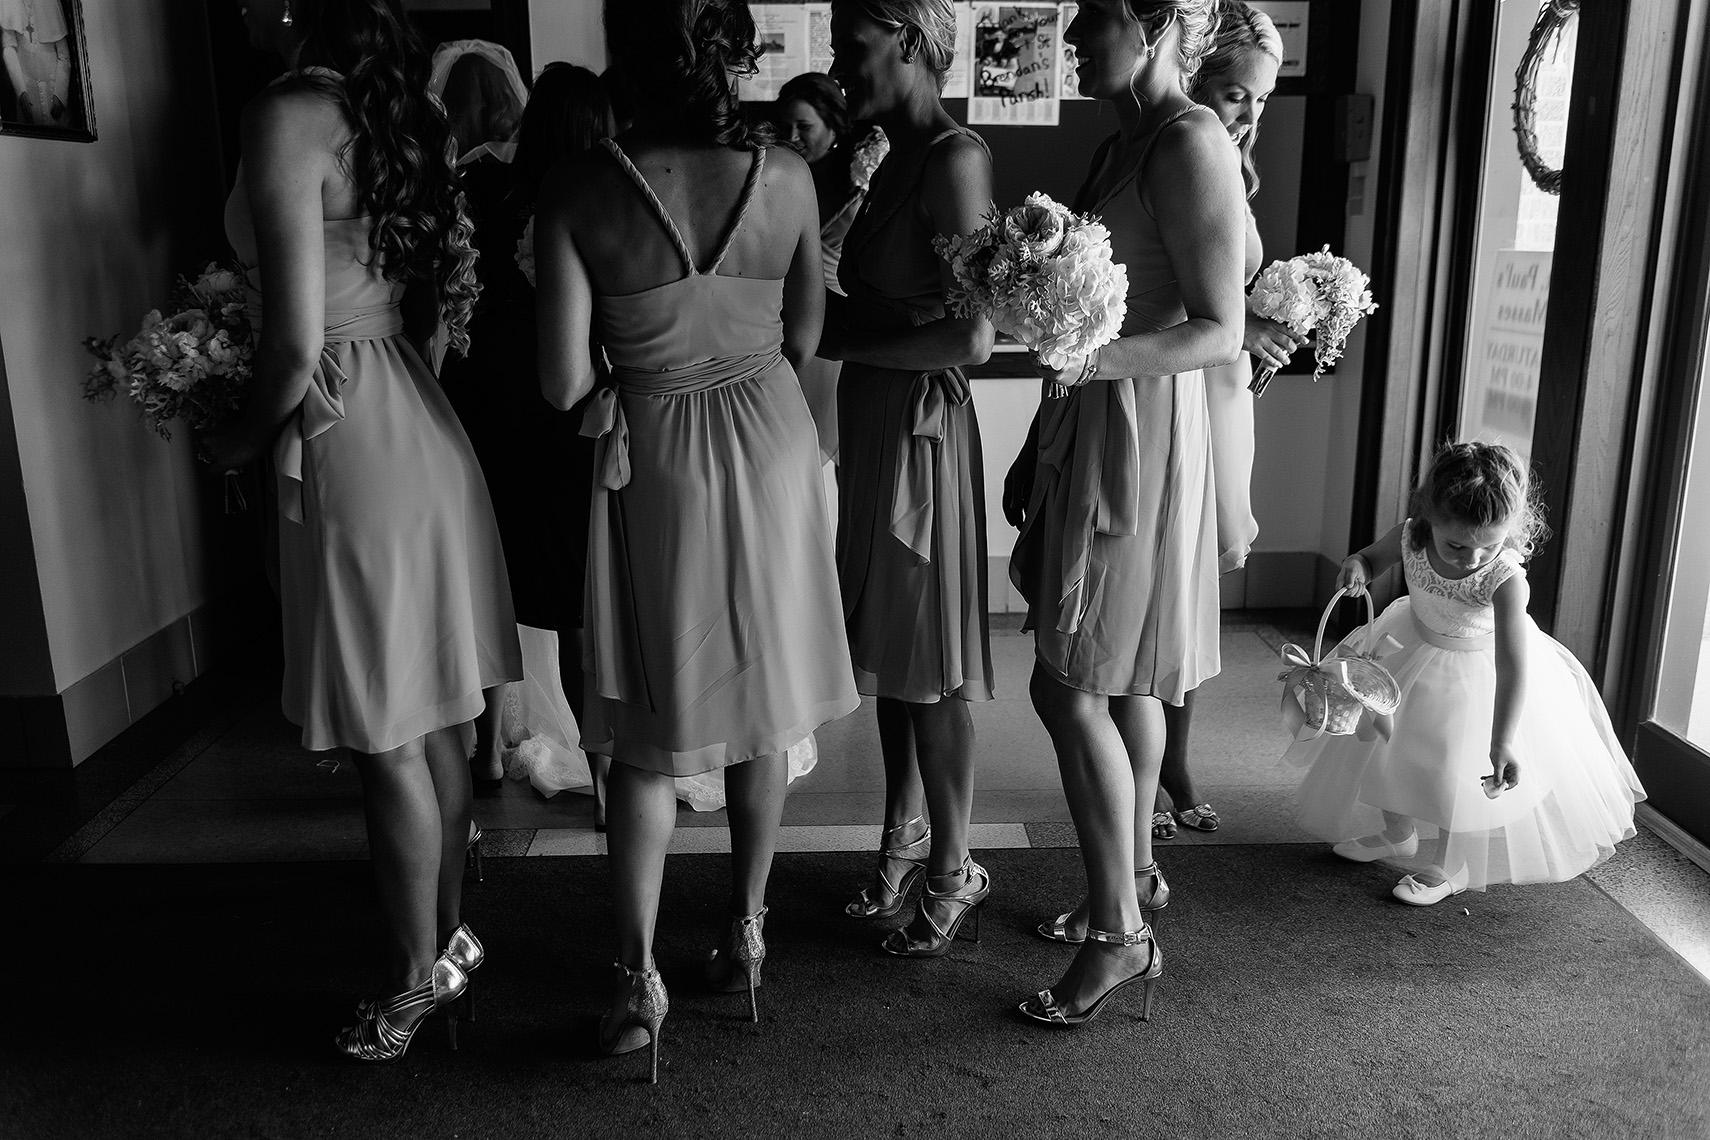 john-schnack-cape-may-destination-wedding-photographer-05.jpg